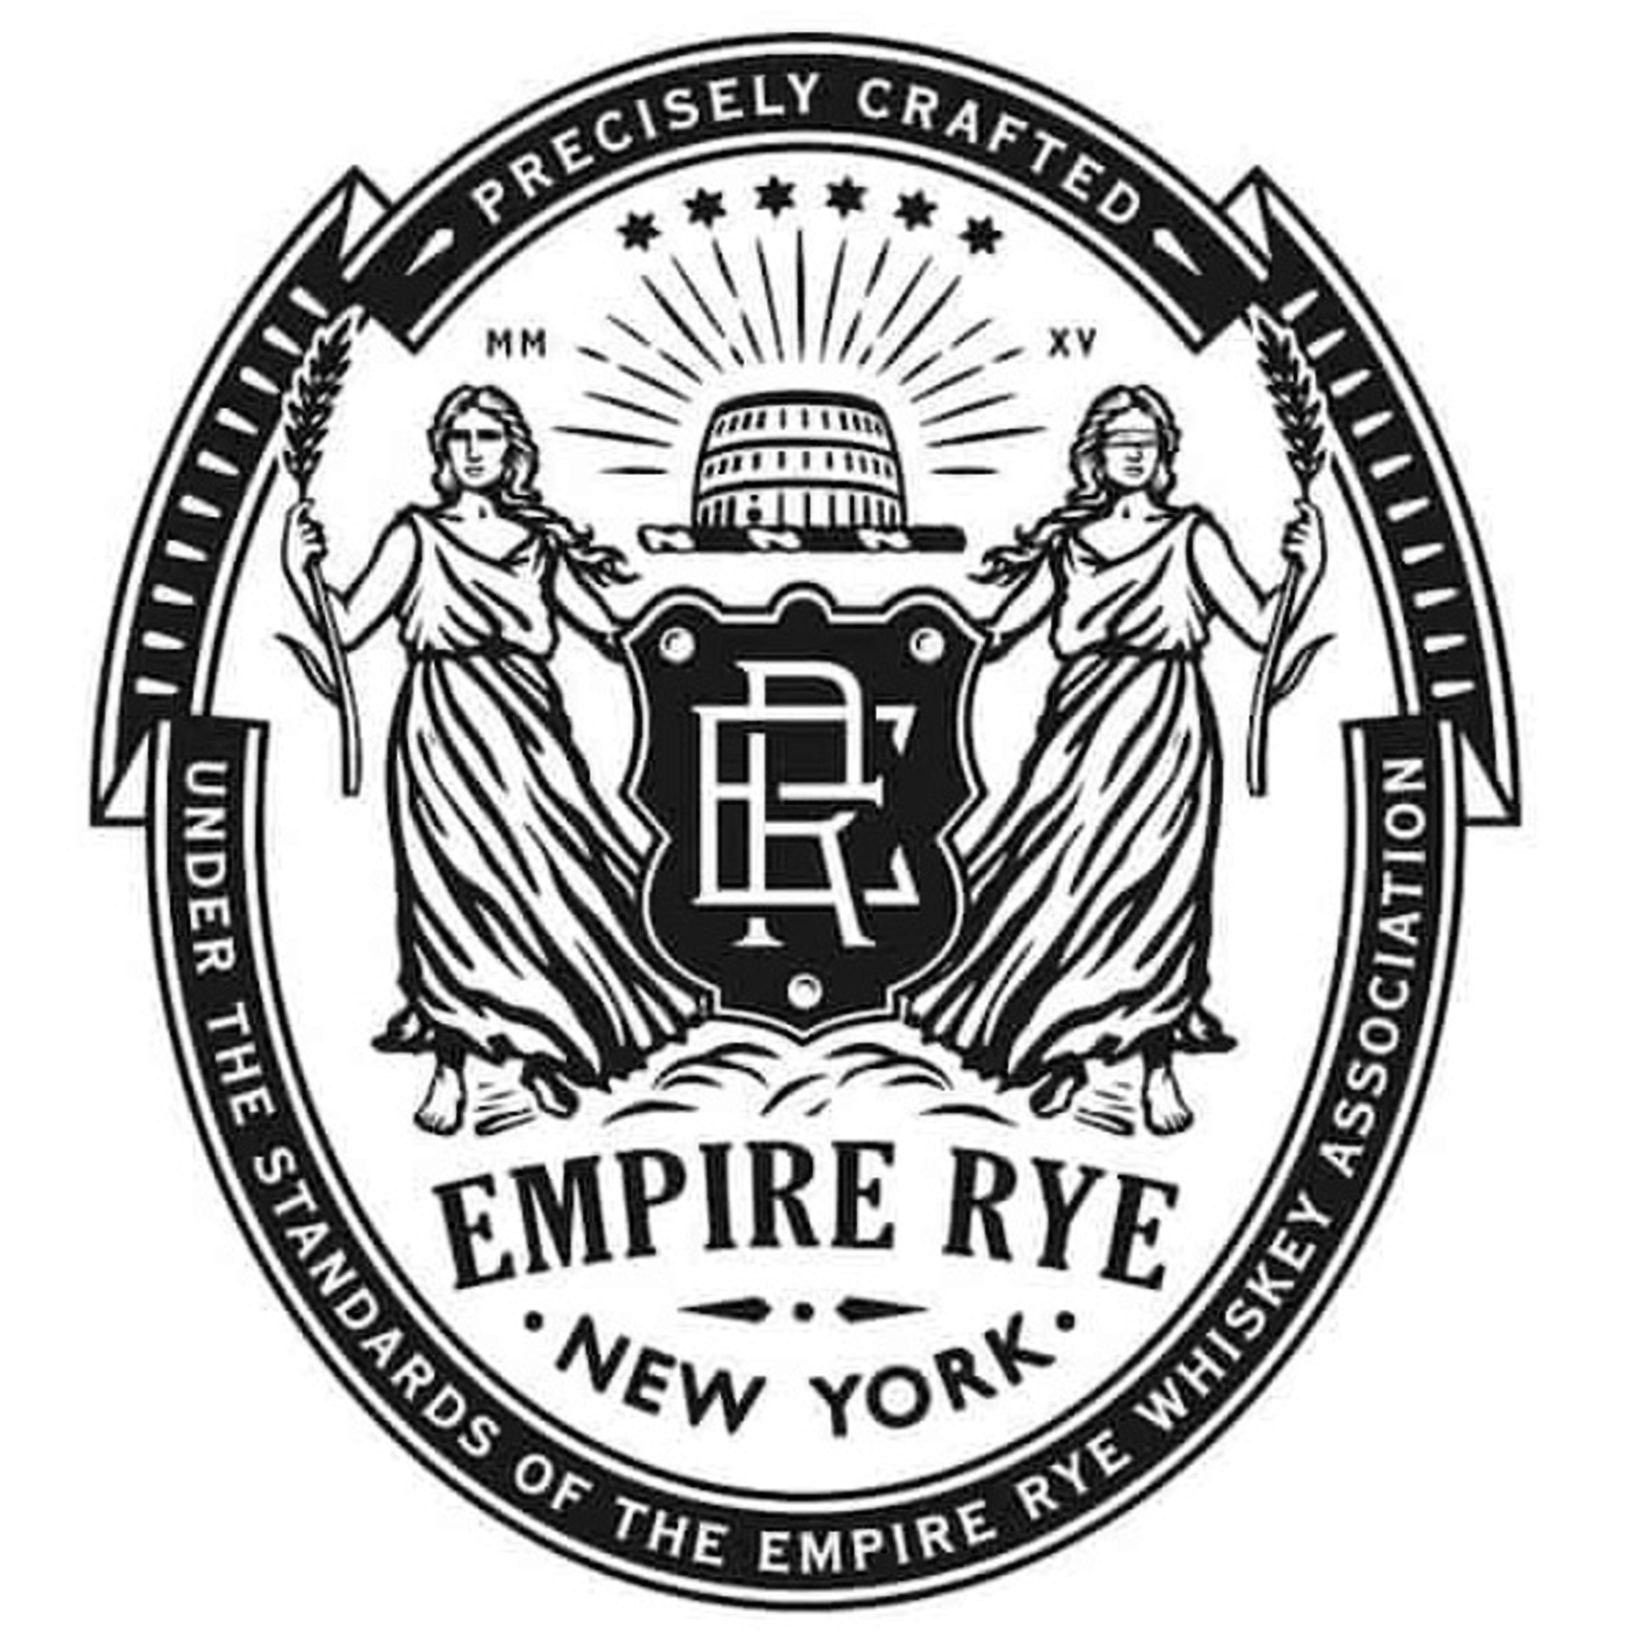 Spirits Kings County Distillery Empire Rye 375ml